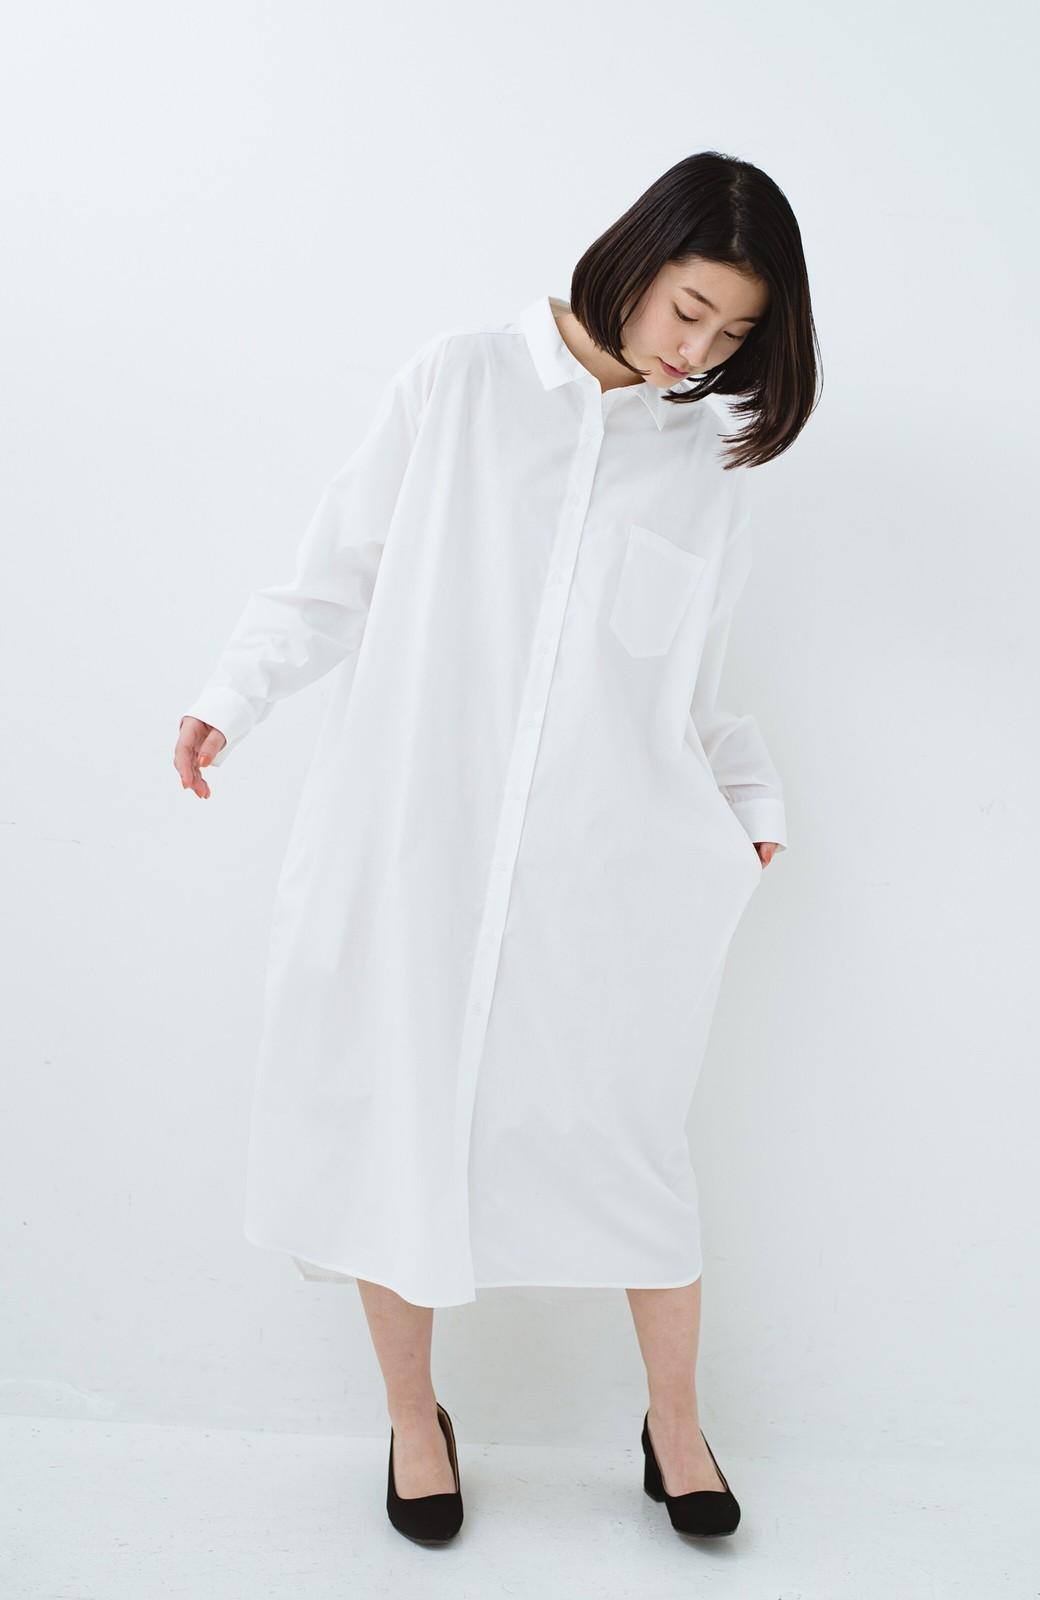 haco! 気持ちが凛と改まる リボン付きオーバーサイズシャツワンピース <ホワイト>の商品写真8